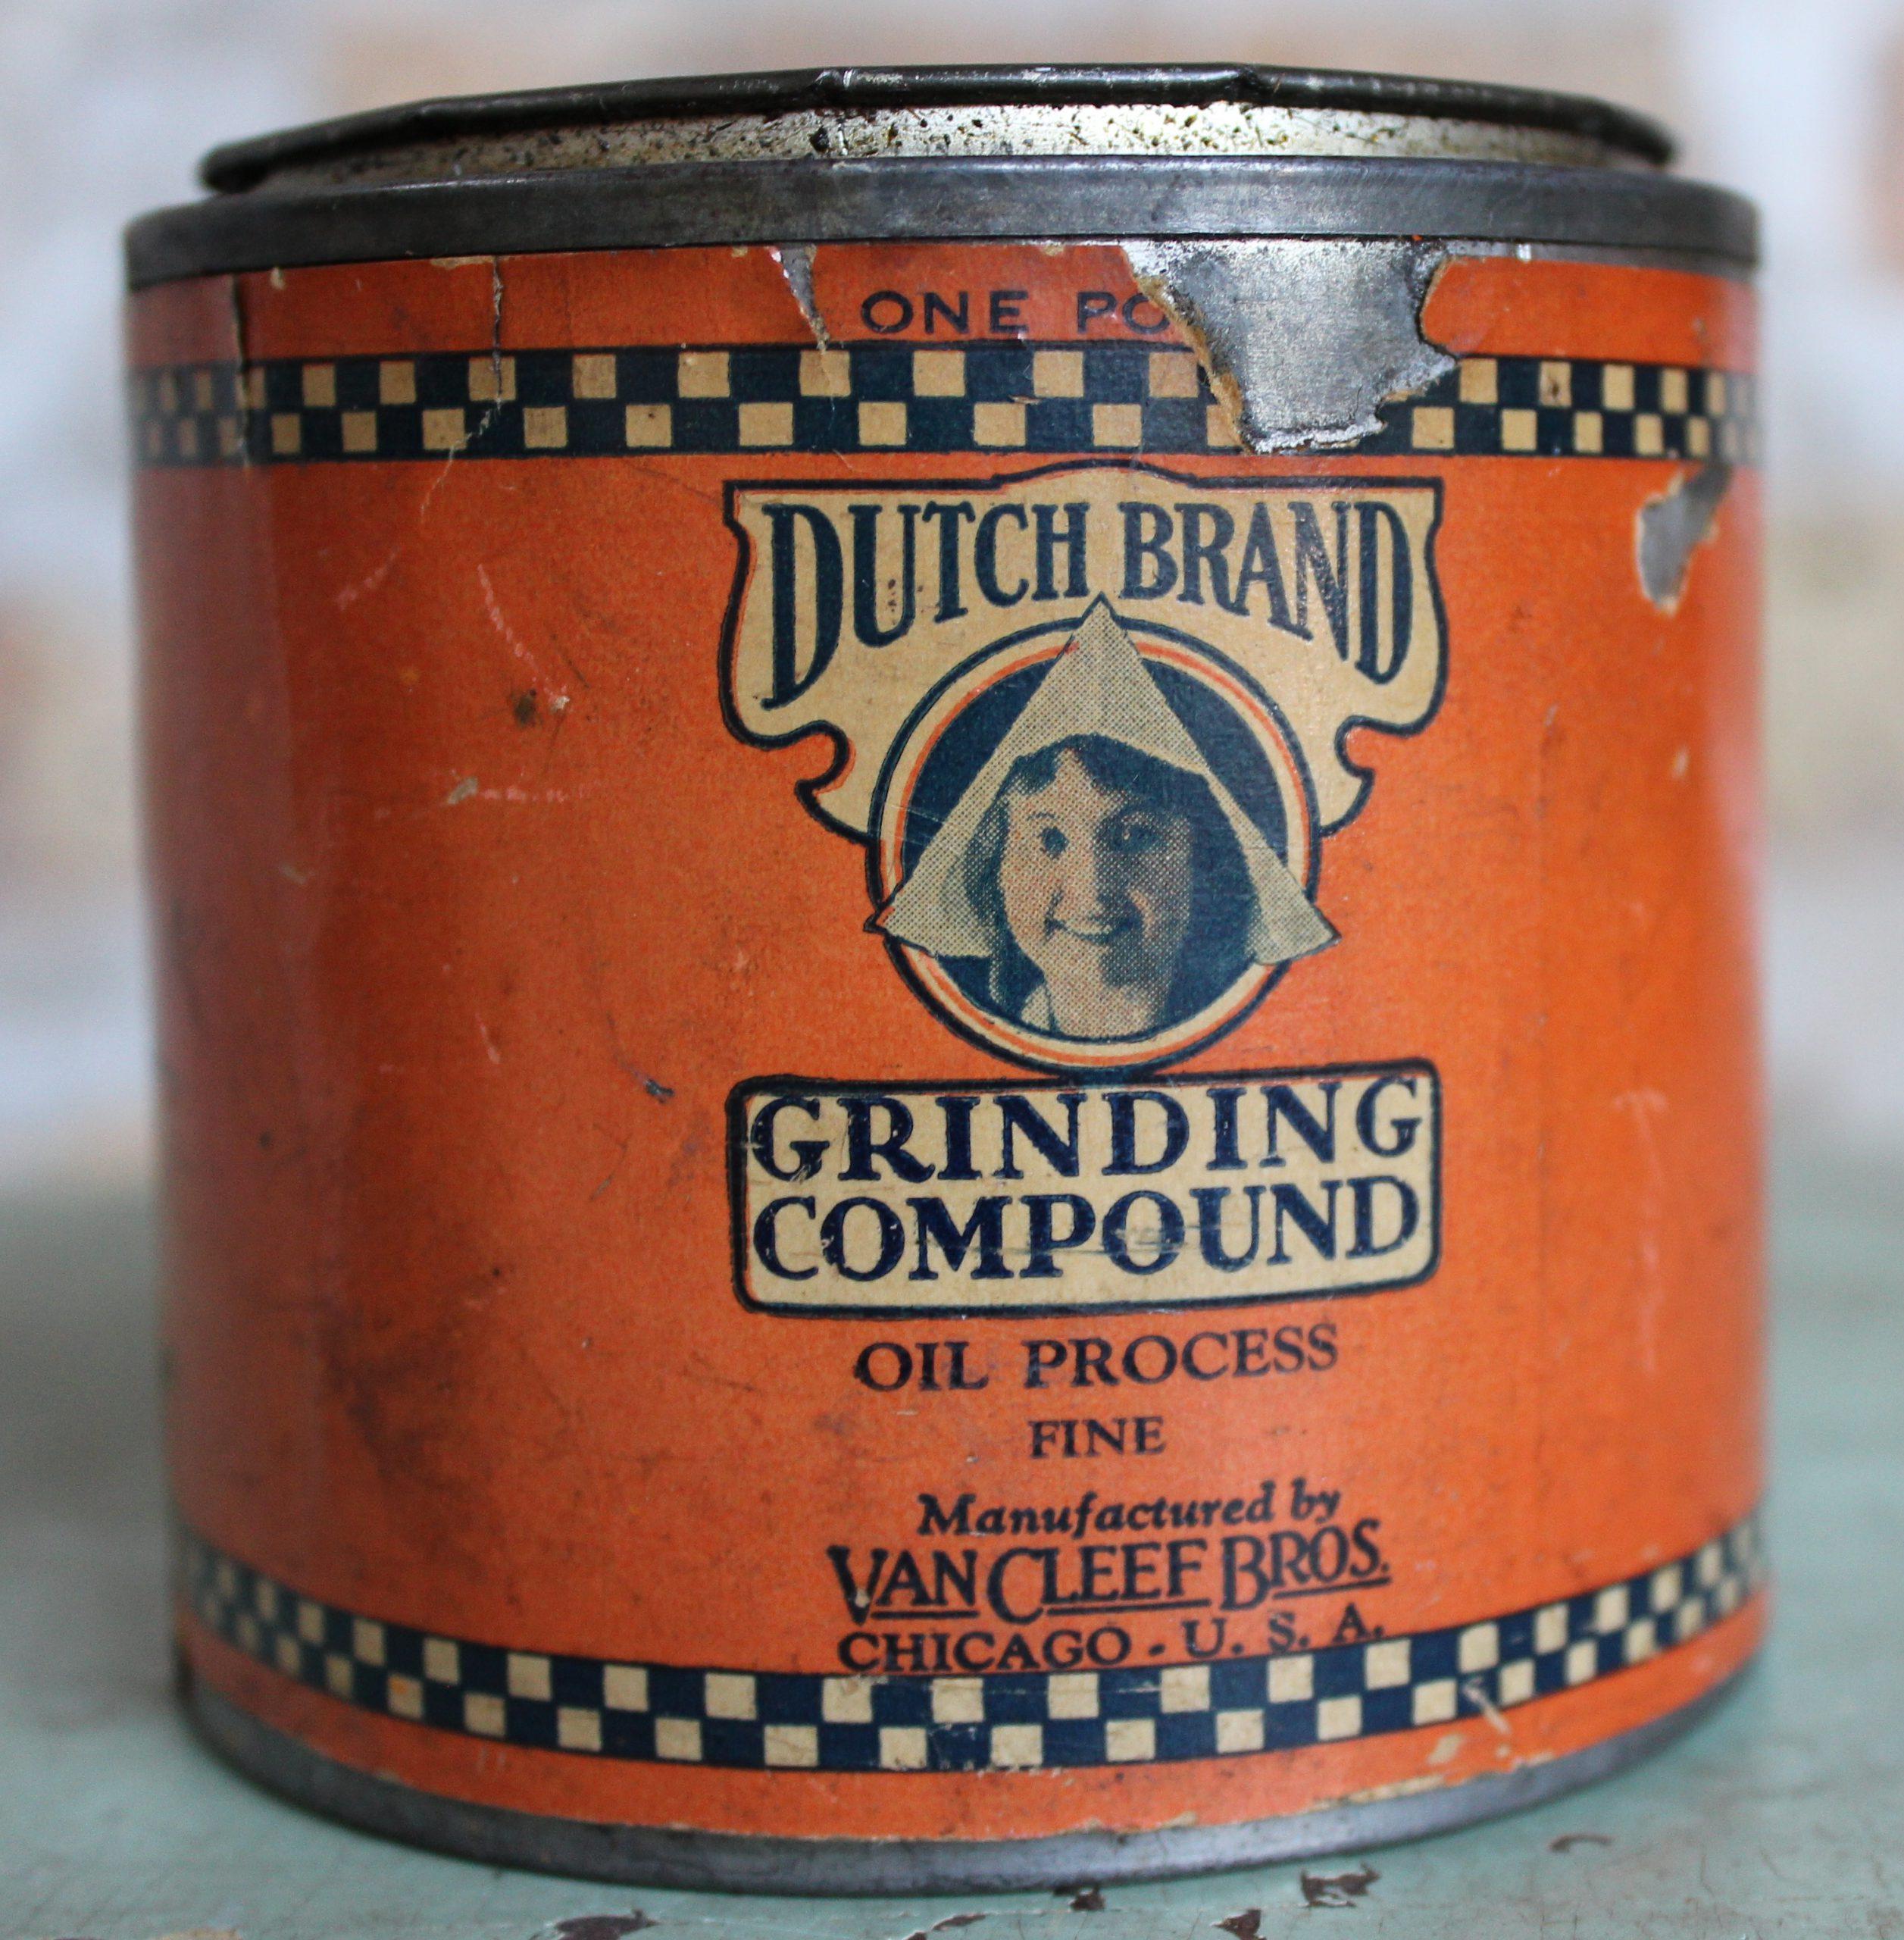 Van Cleef Bros Dutch Brand History